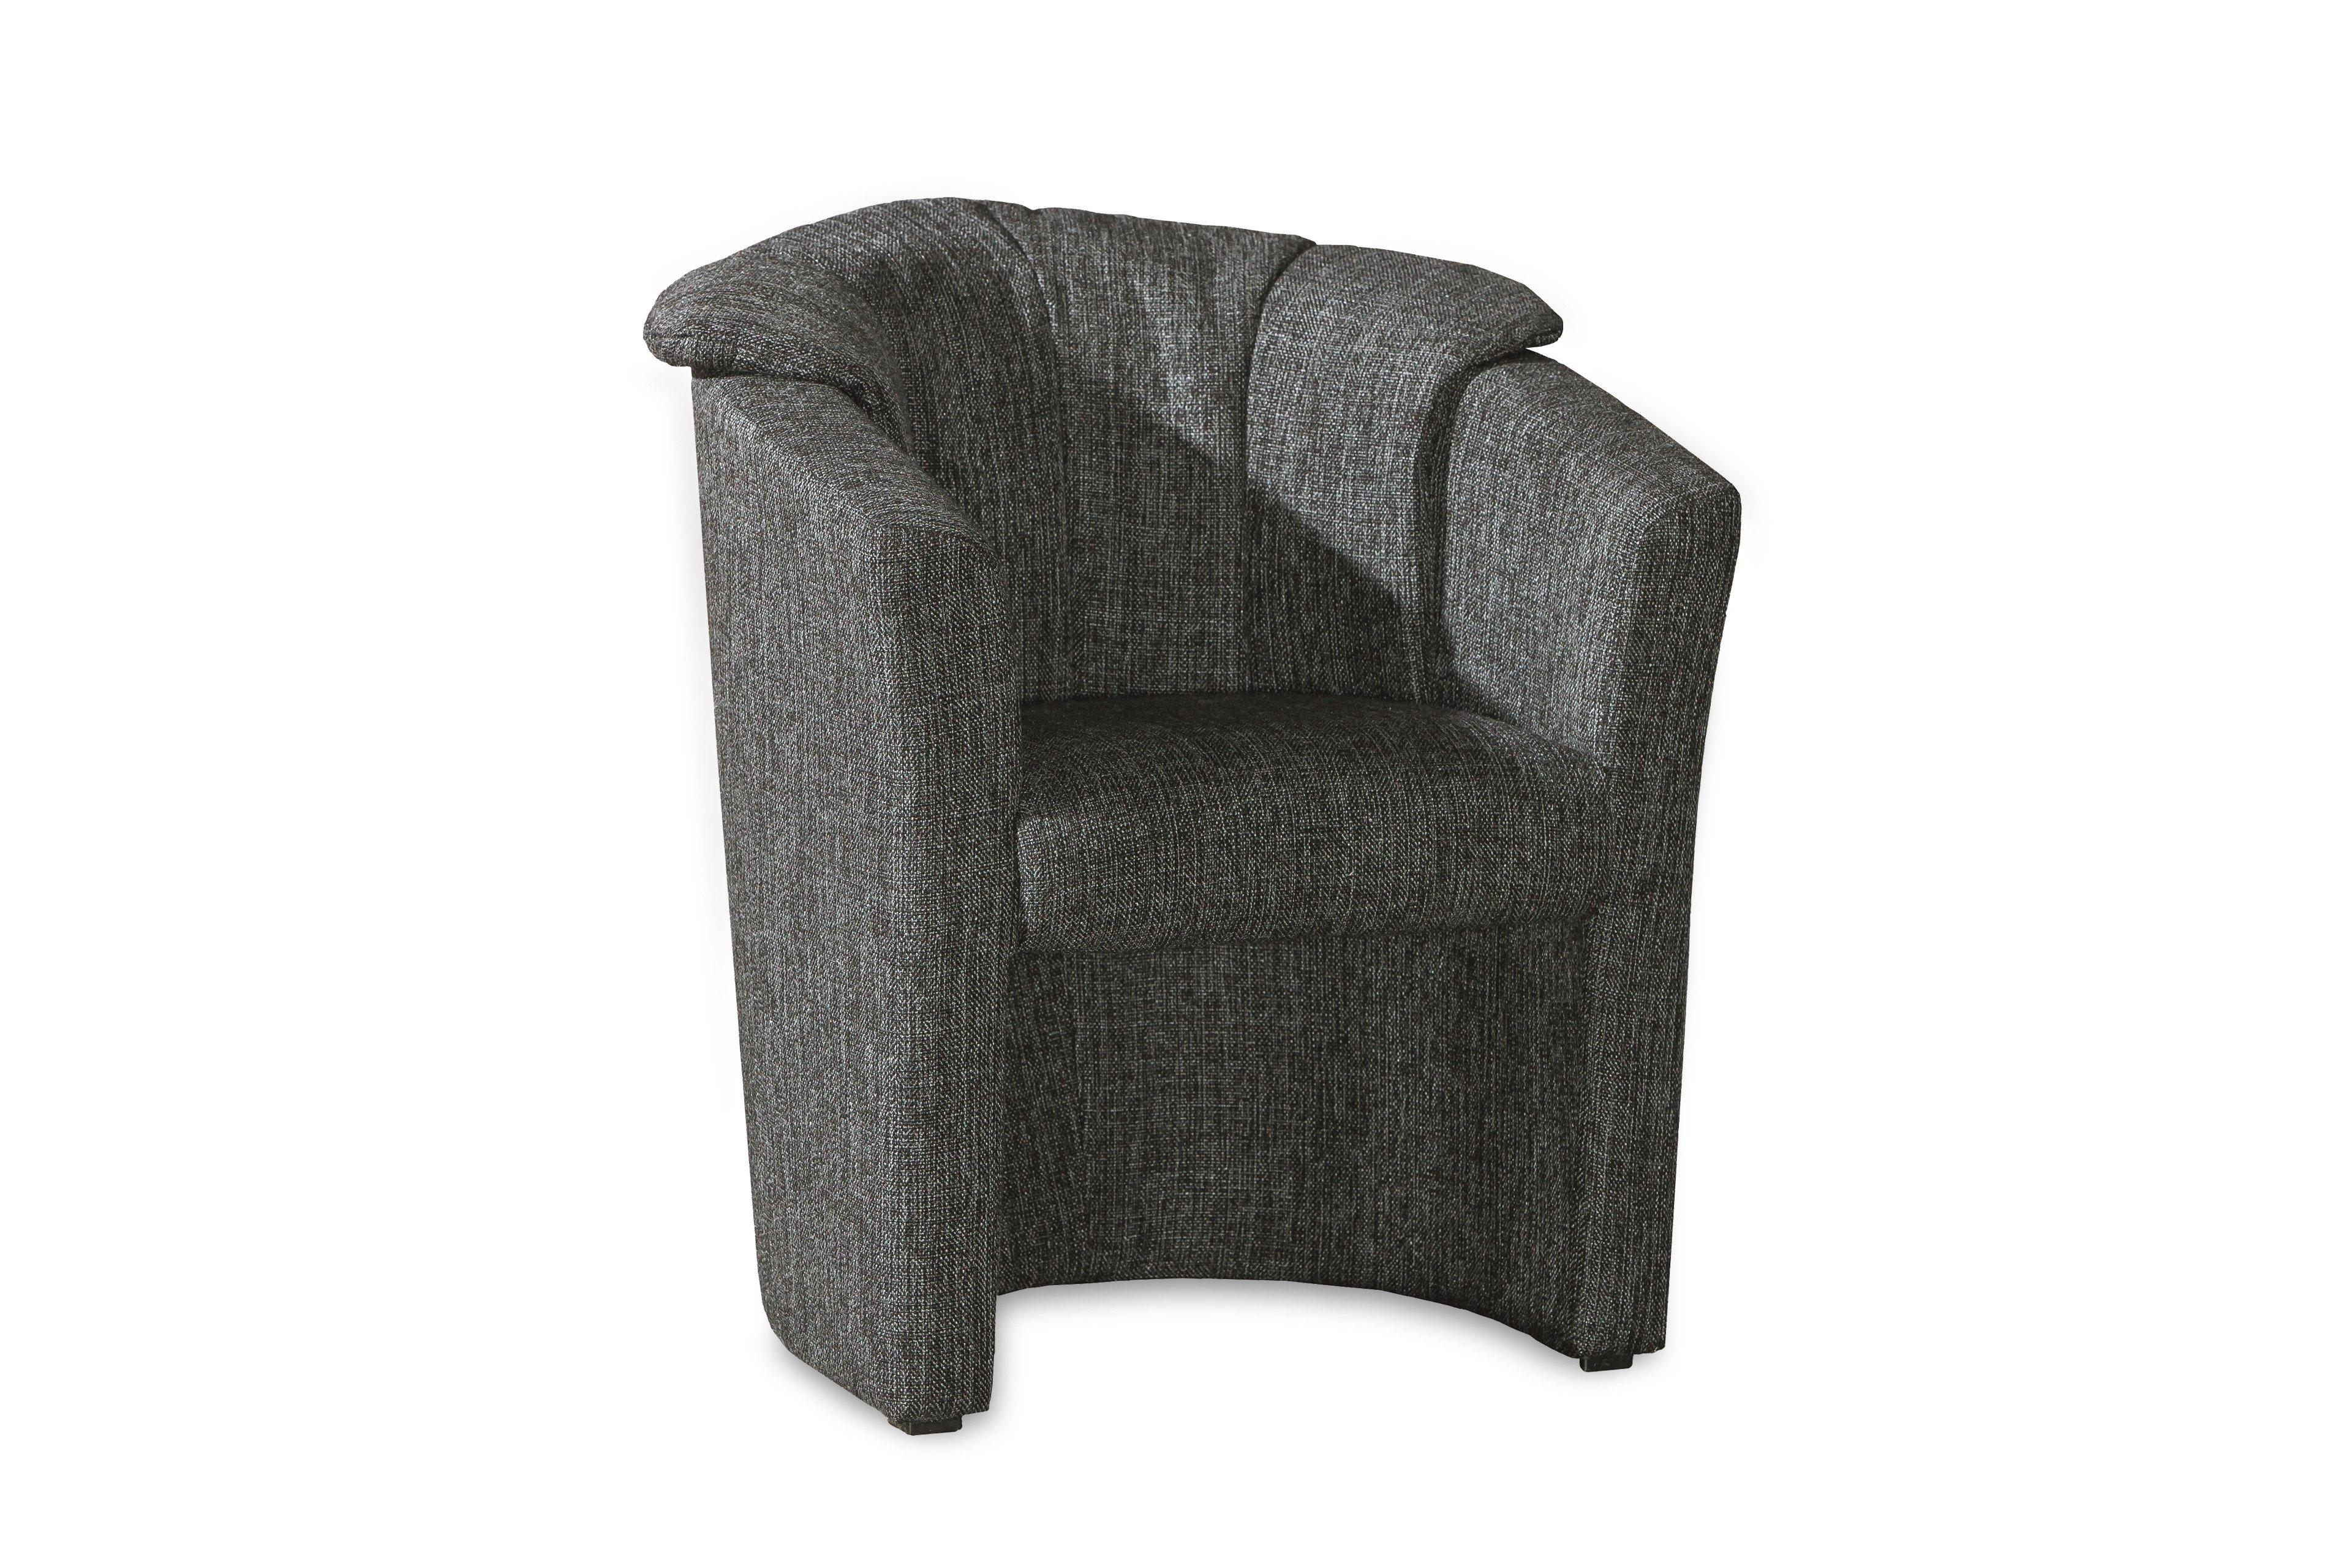 sessel ludwig von restyl grau m bel letz ihr online shop. Black Bedroom Furniture Sets. Home Design Ideas